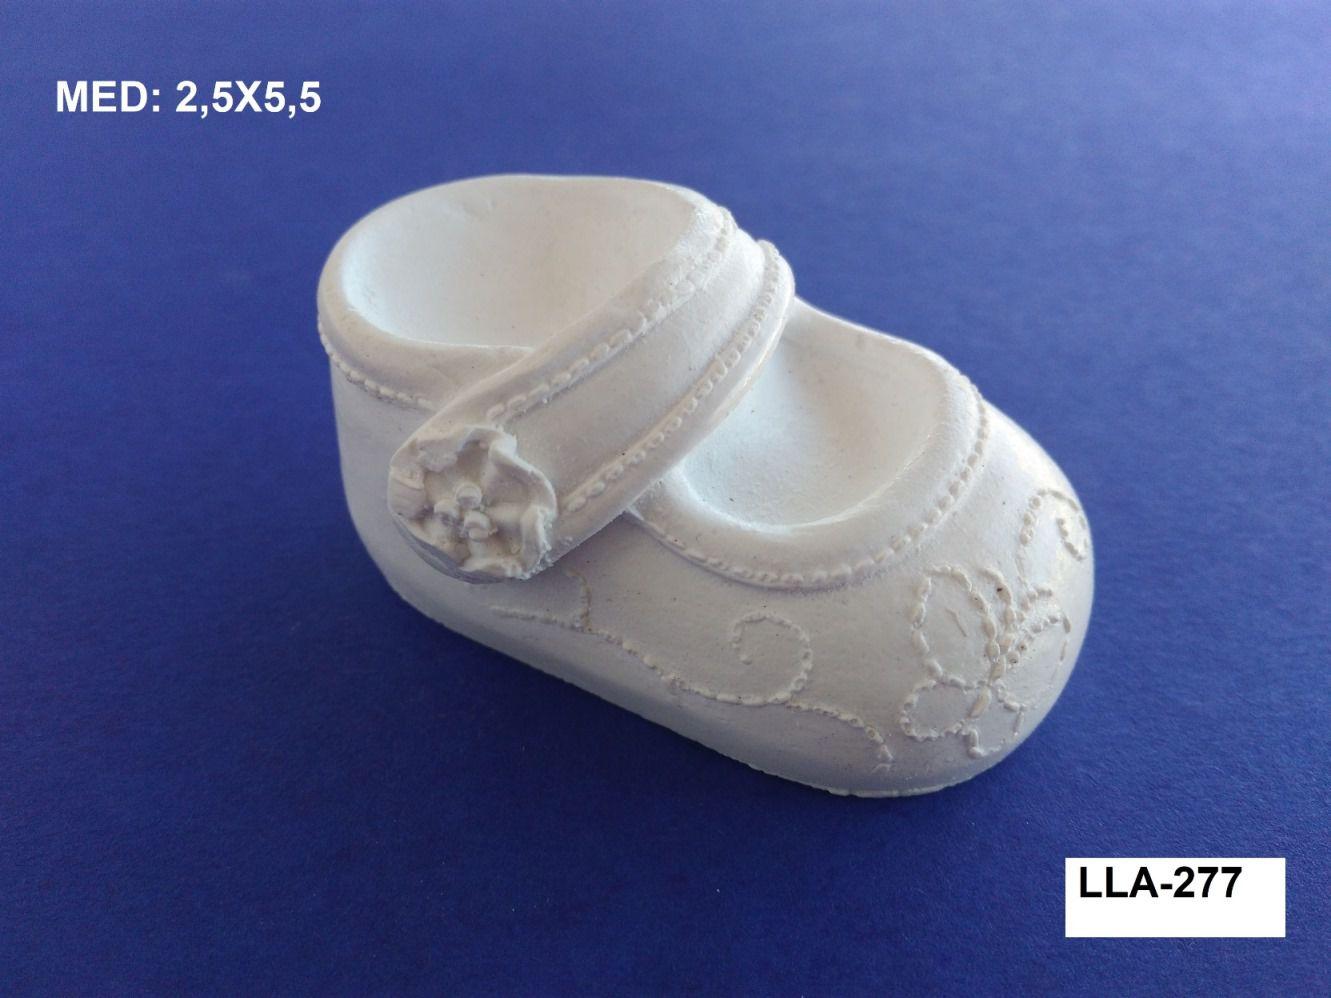 LLA-277 APLIQUE SAPATO 3D 2,5X5,5CM